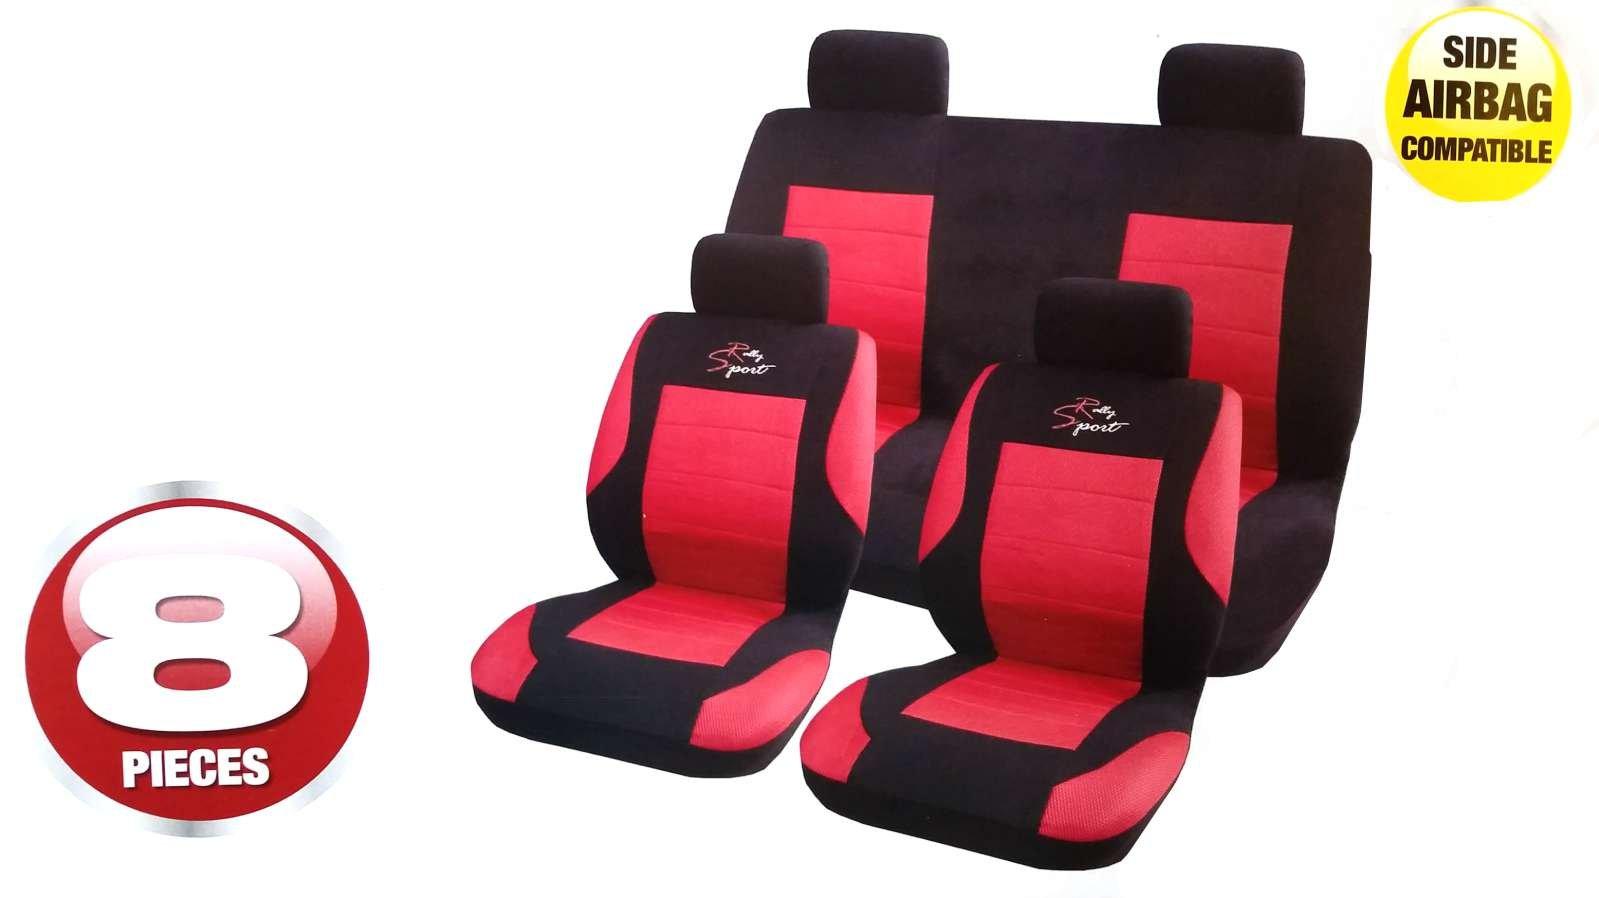 Includes XtremeAuto Sticker XtremeAuto/® 14 Comet Pro Blue Car Wheel Trims Hub Cap Includes Cable Ties And Valve Caps